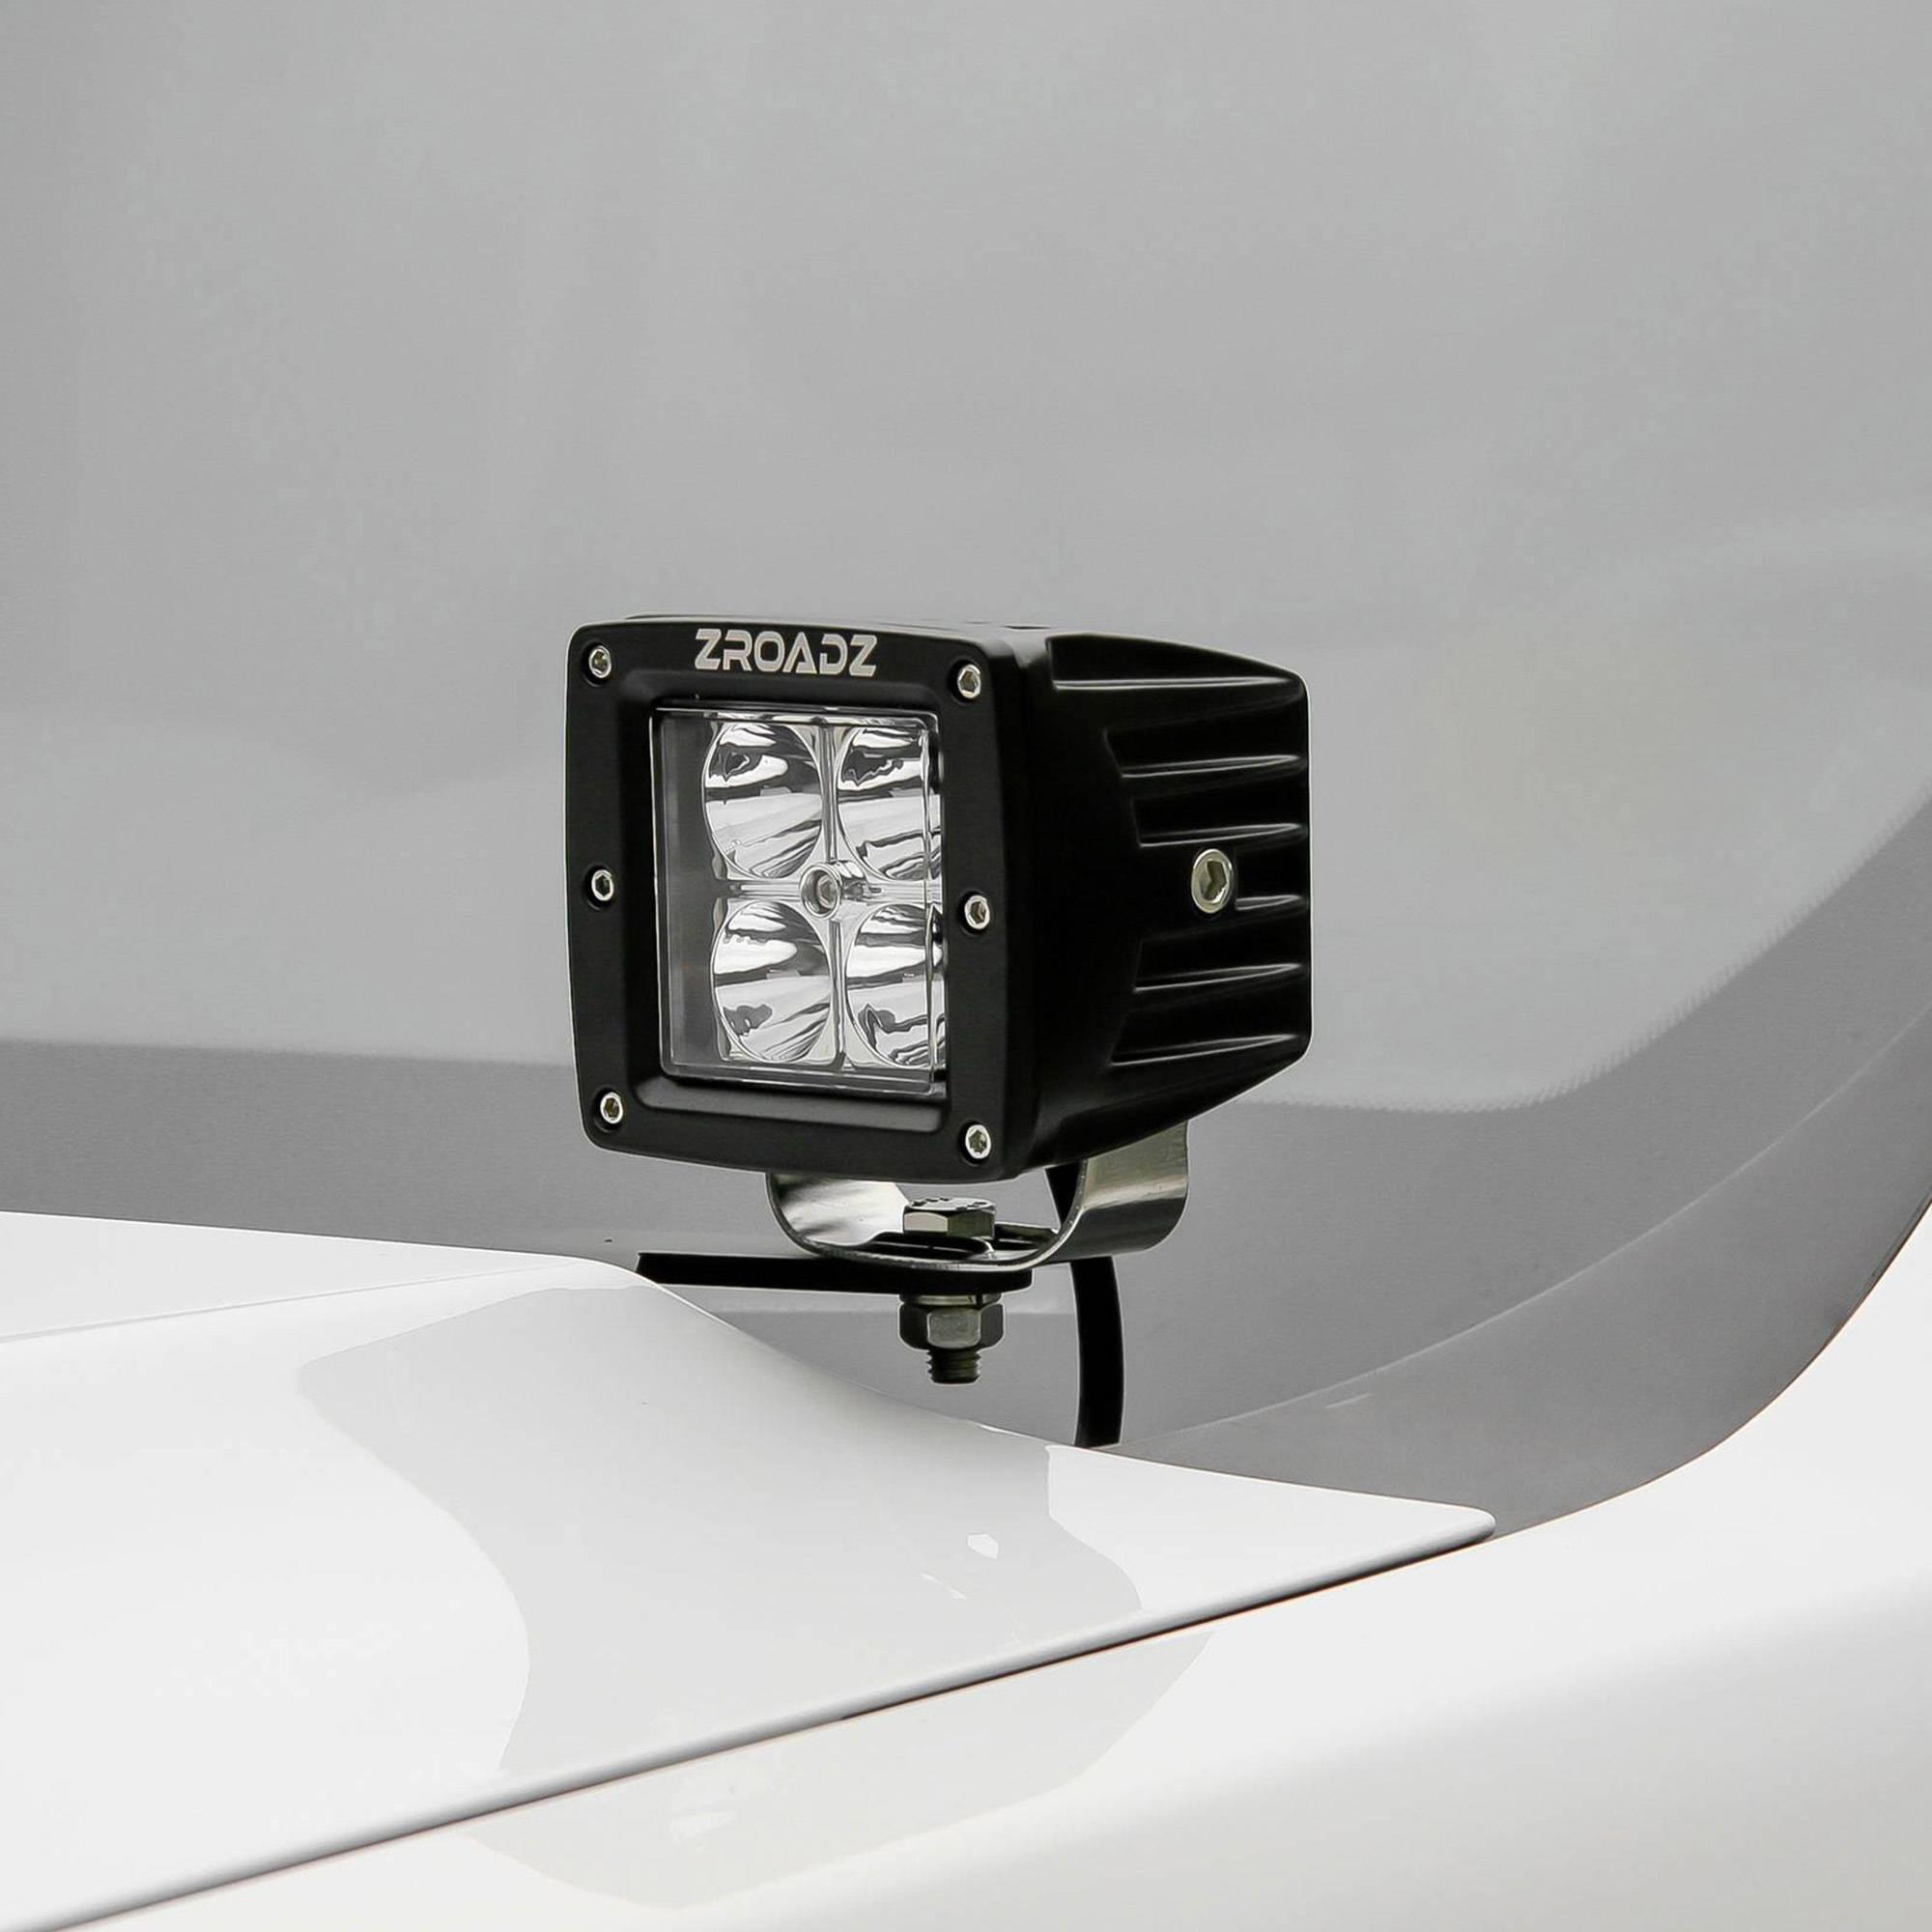 ZROADZ OFF ROAD PRODUCTS - 2005-2015 Toyota Tacoma Hood Hinge LED Kit with (2) 3 Inch LED Pod Lights - PN #Z369381-KIT2